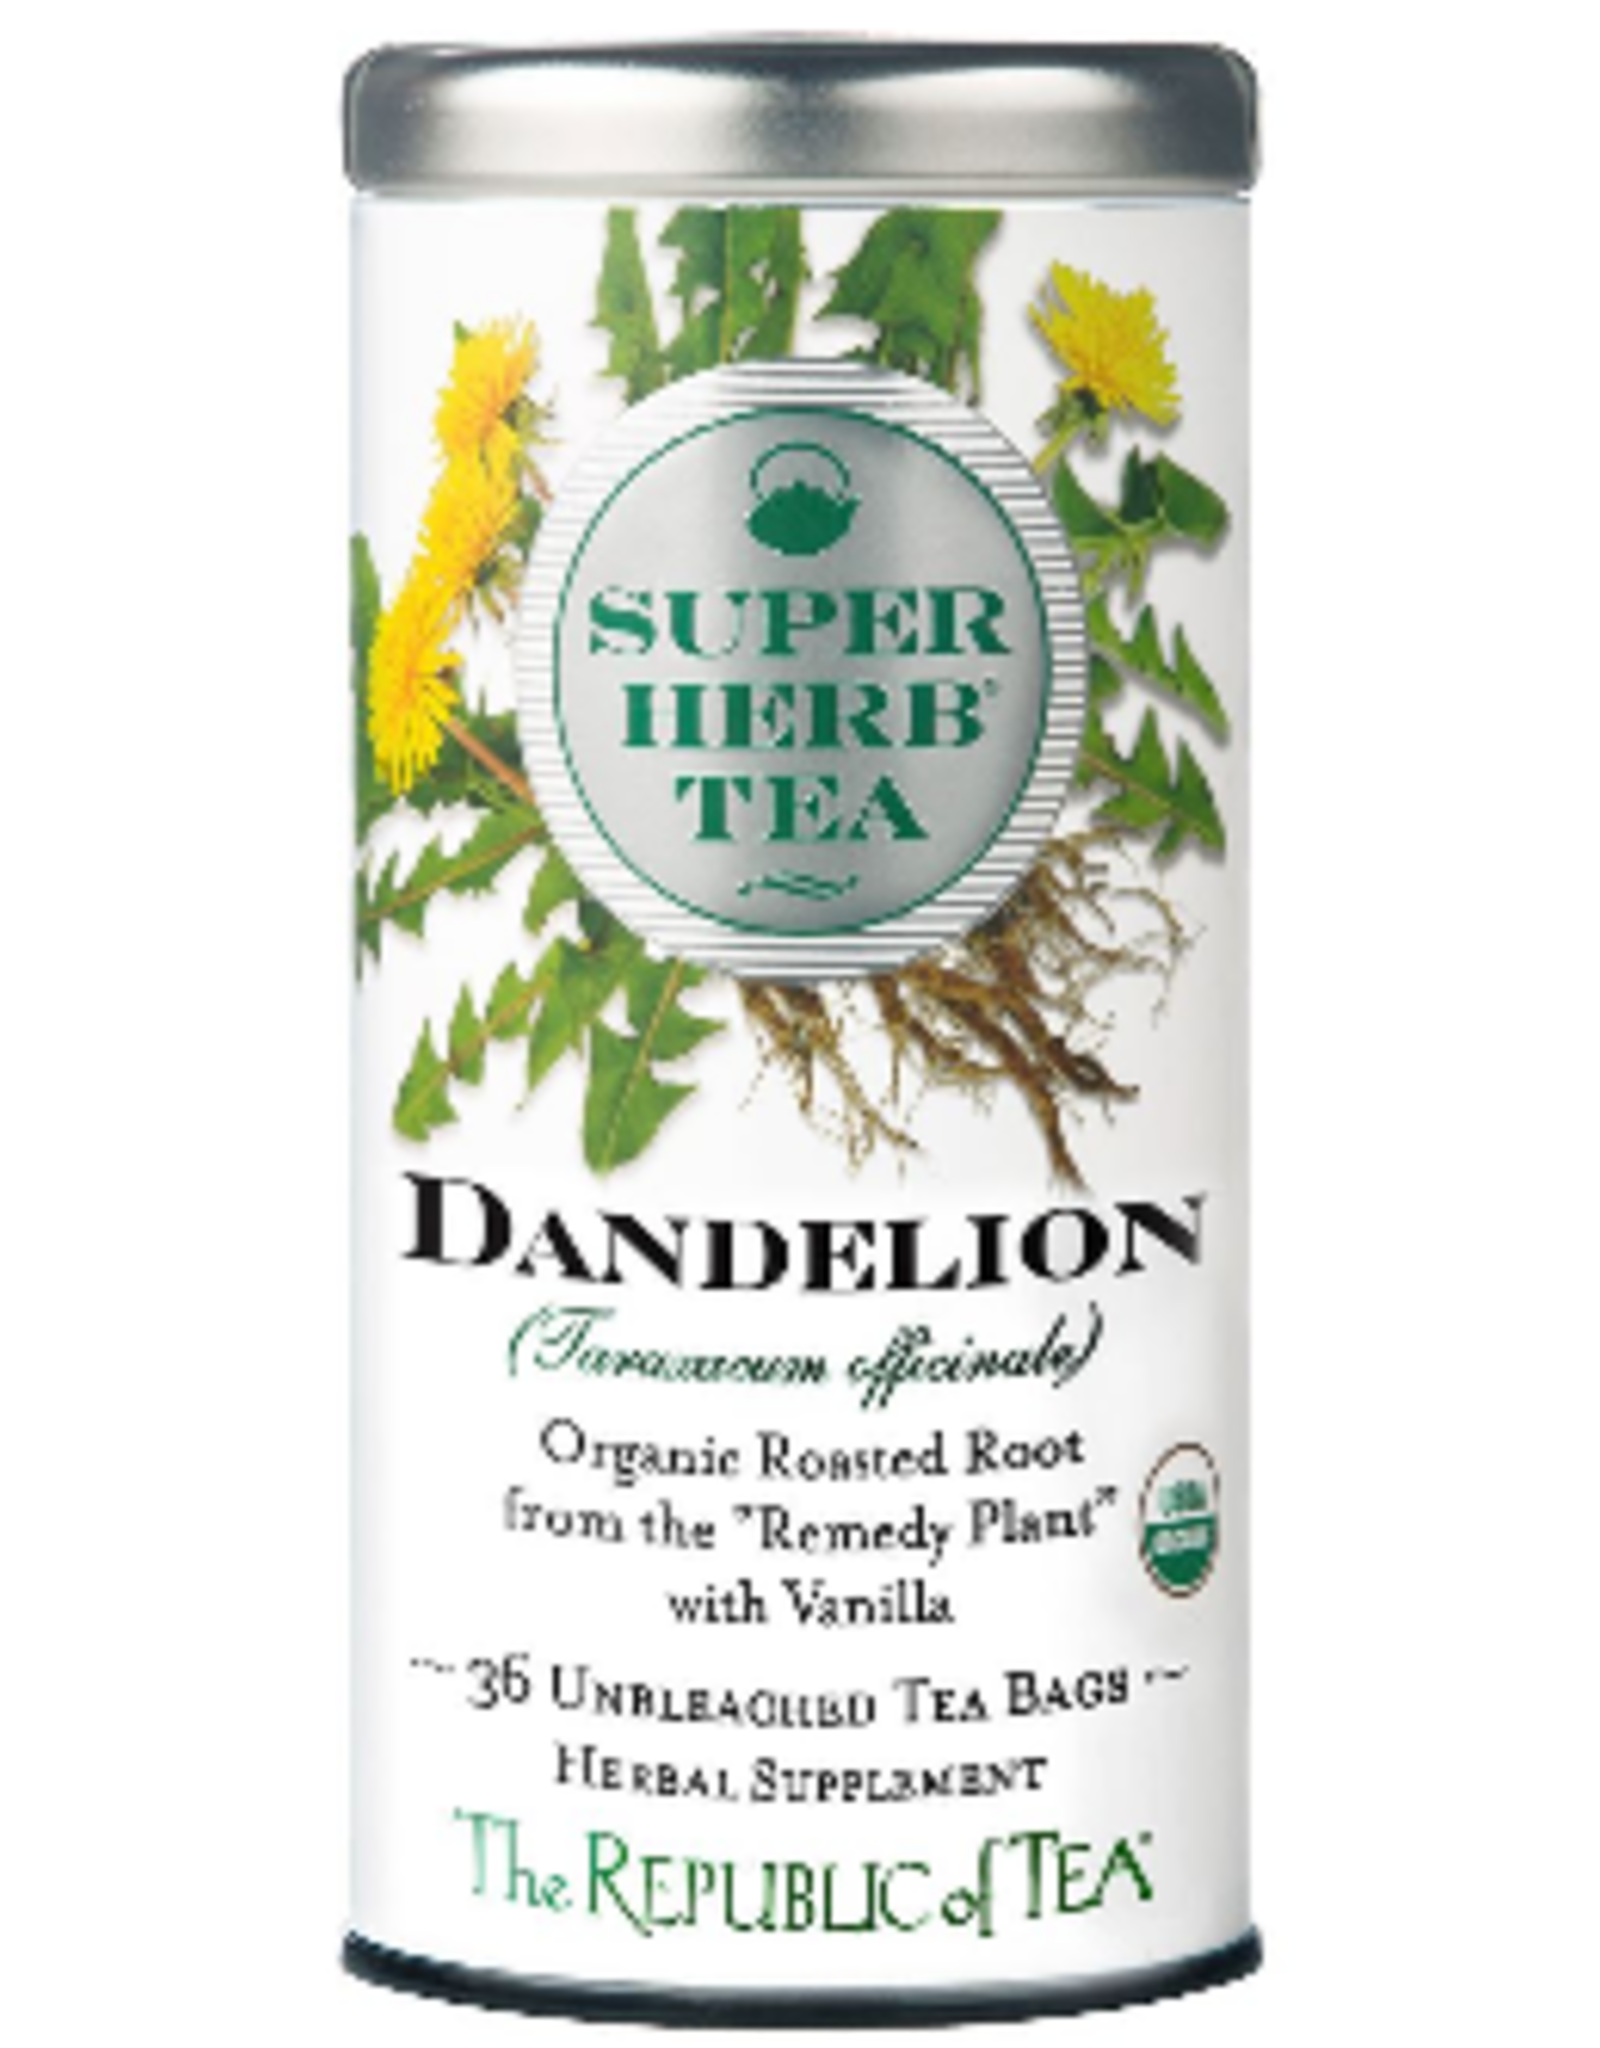 The Republic of Tea Dandelion SuperHerb Tea, 36 Bag Tin